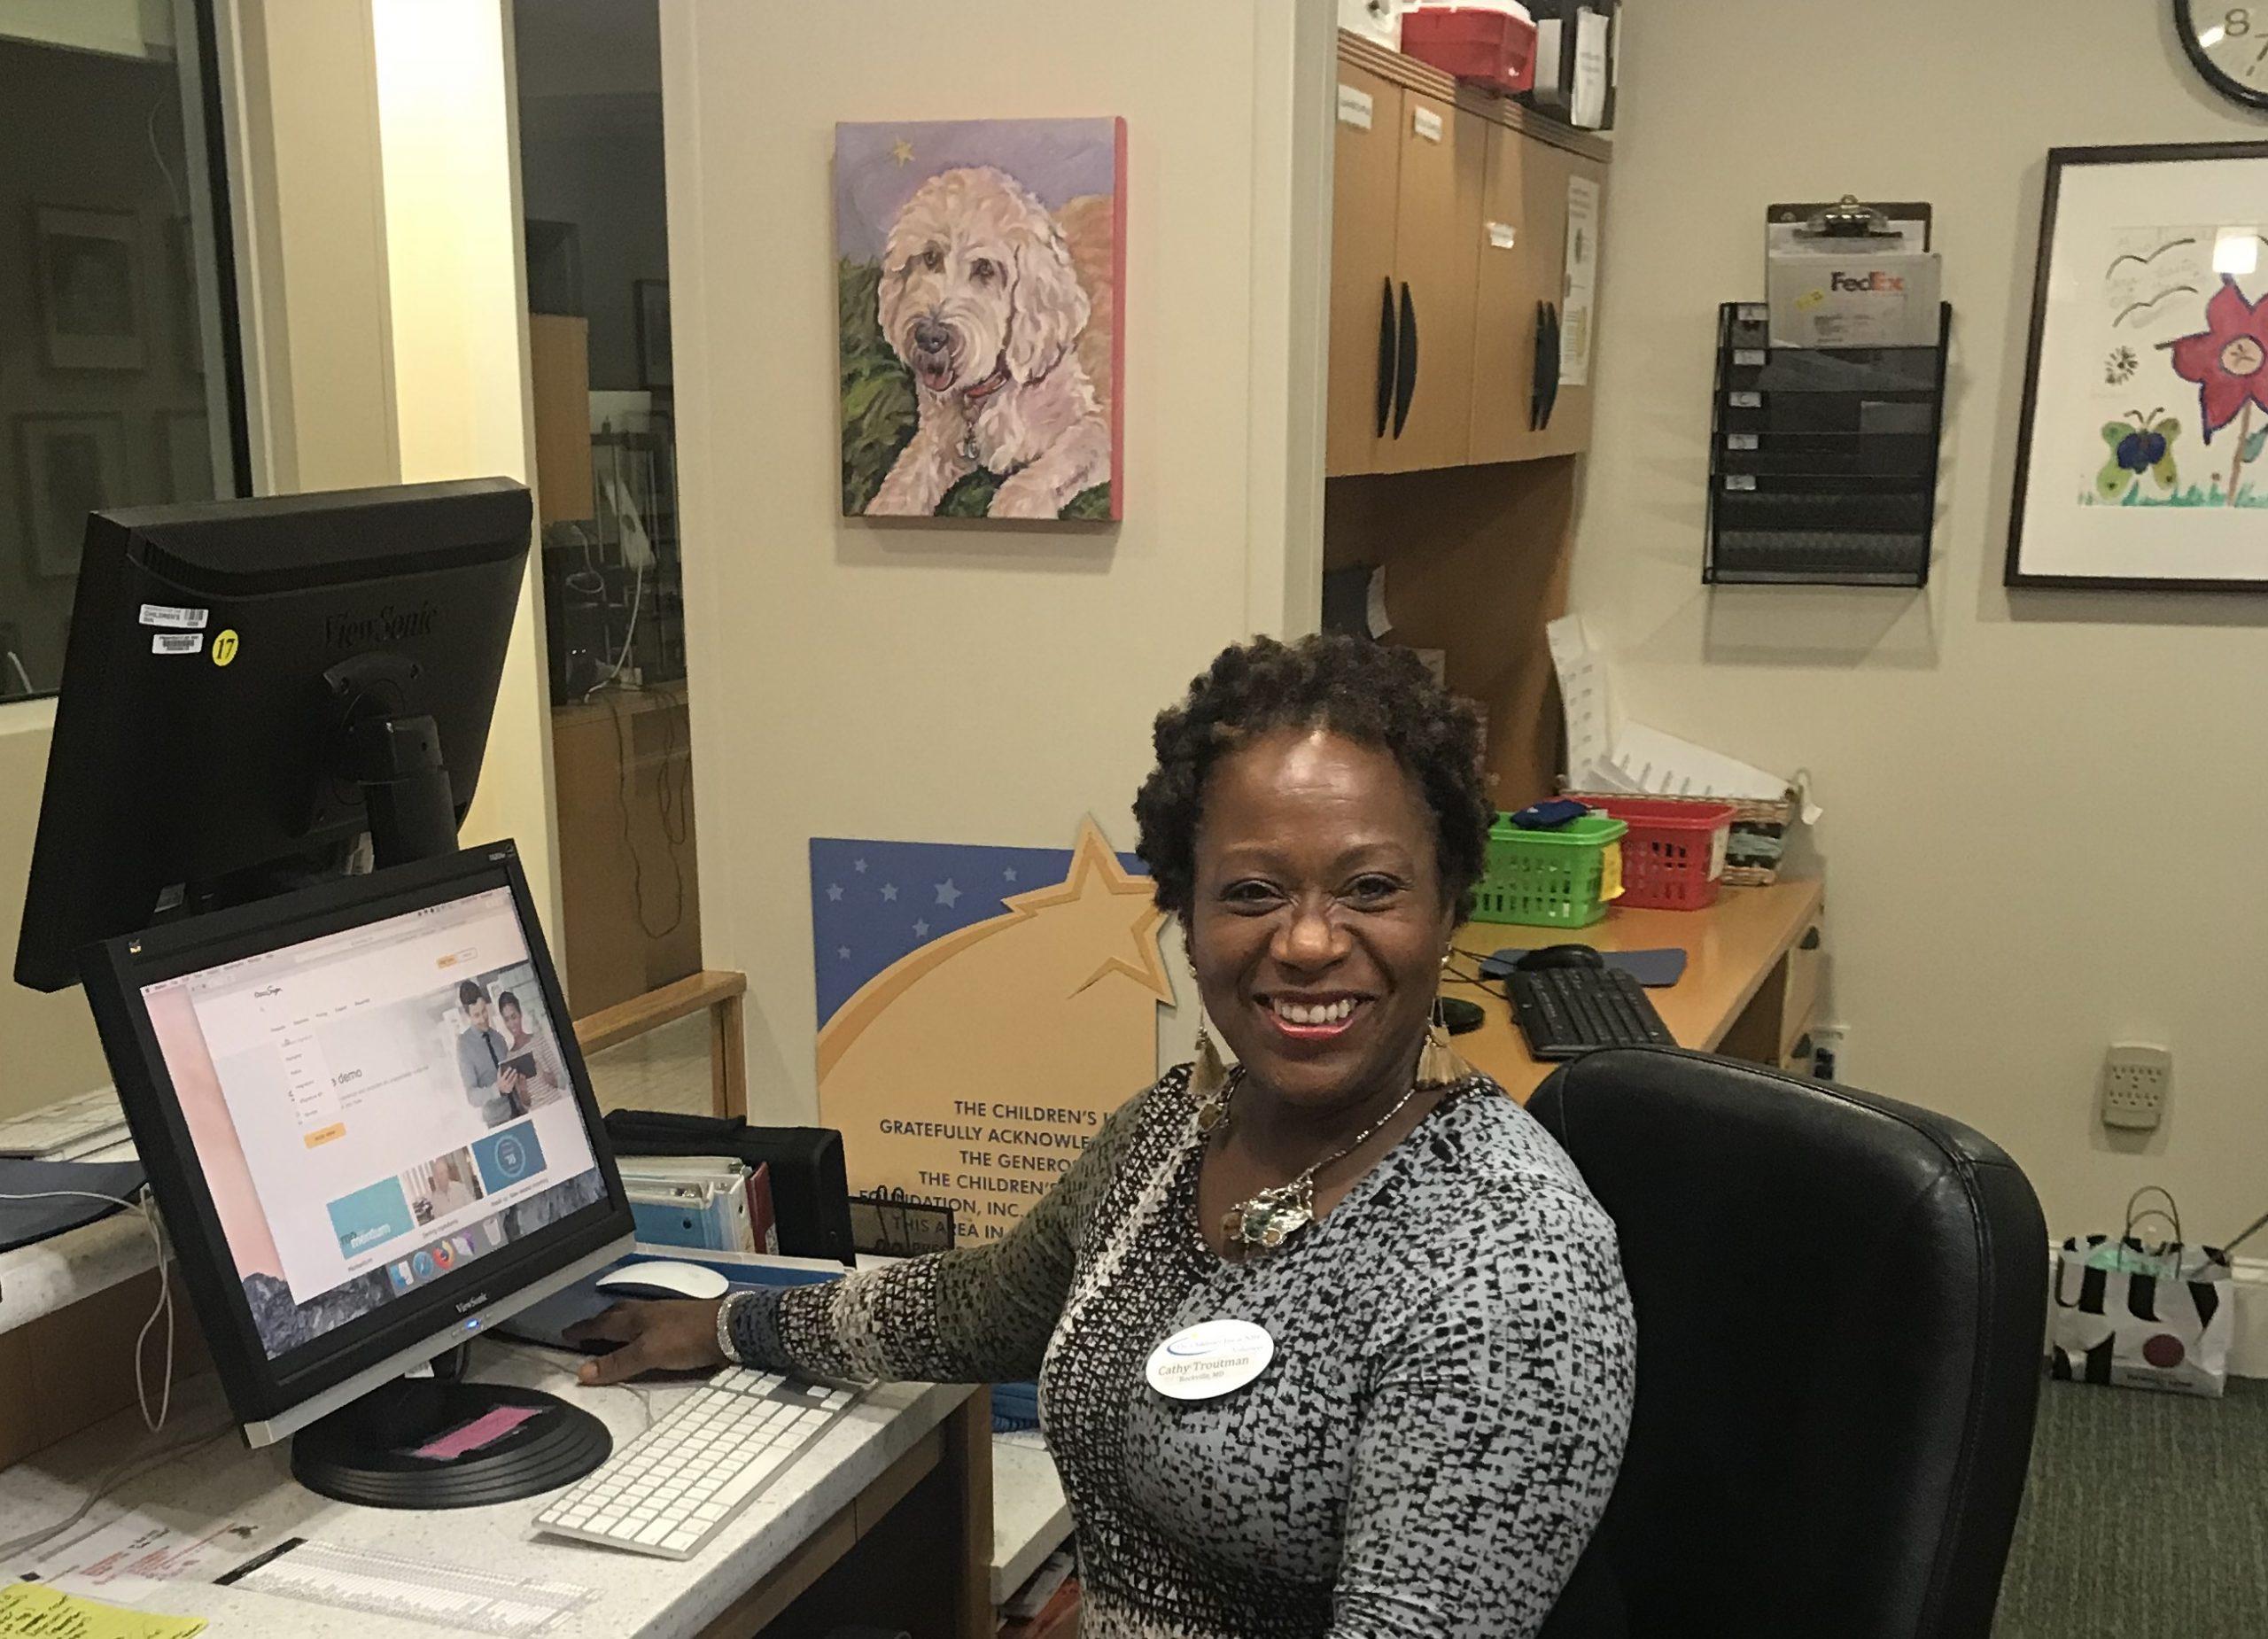 Cathy Troutman at volunteer desk of The Children